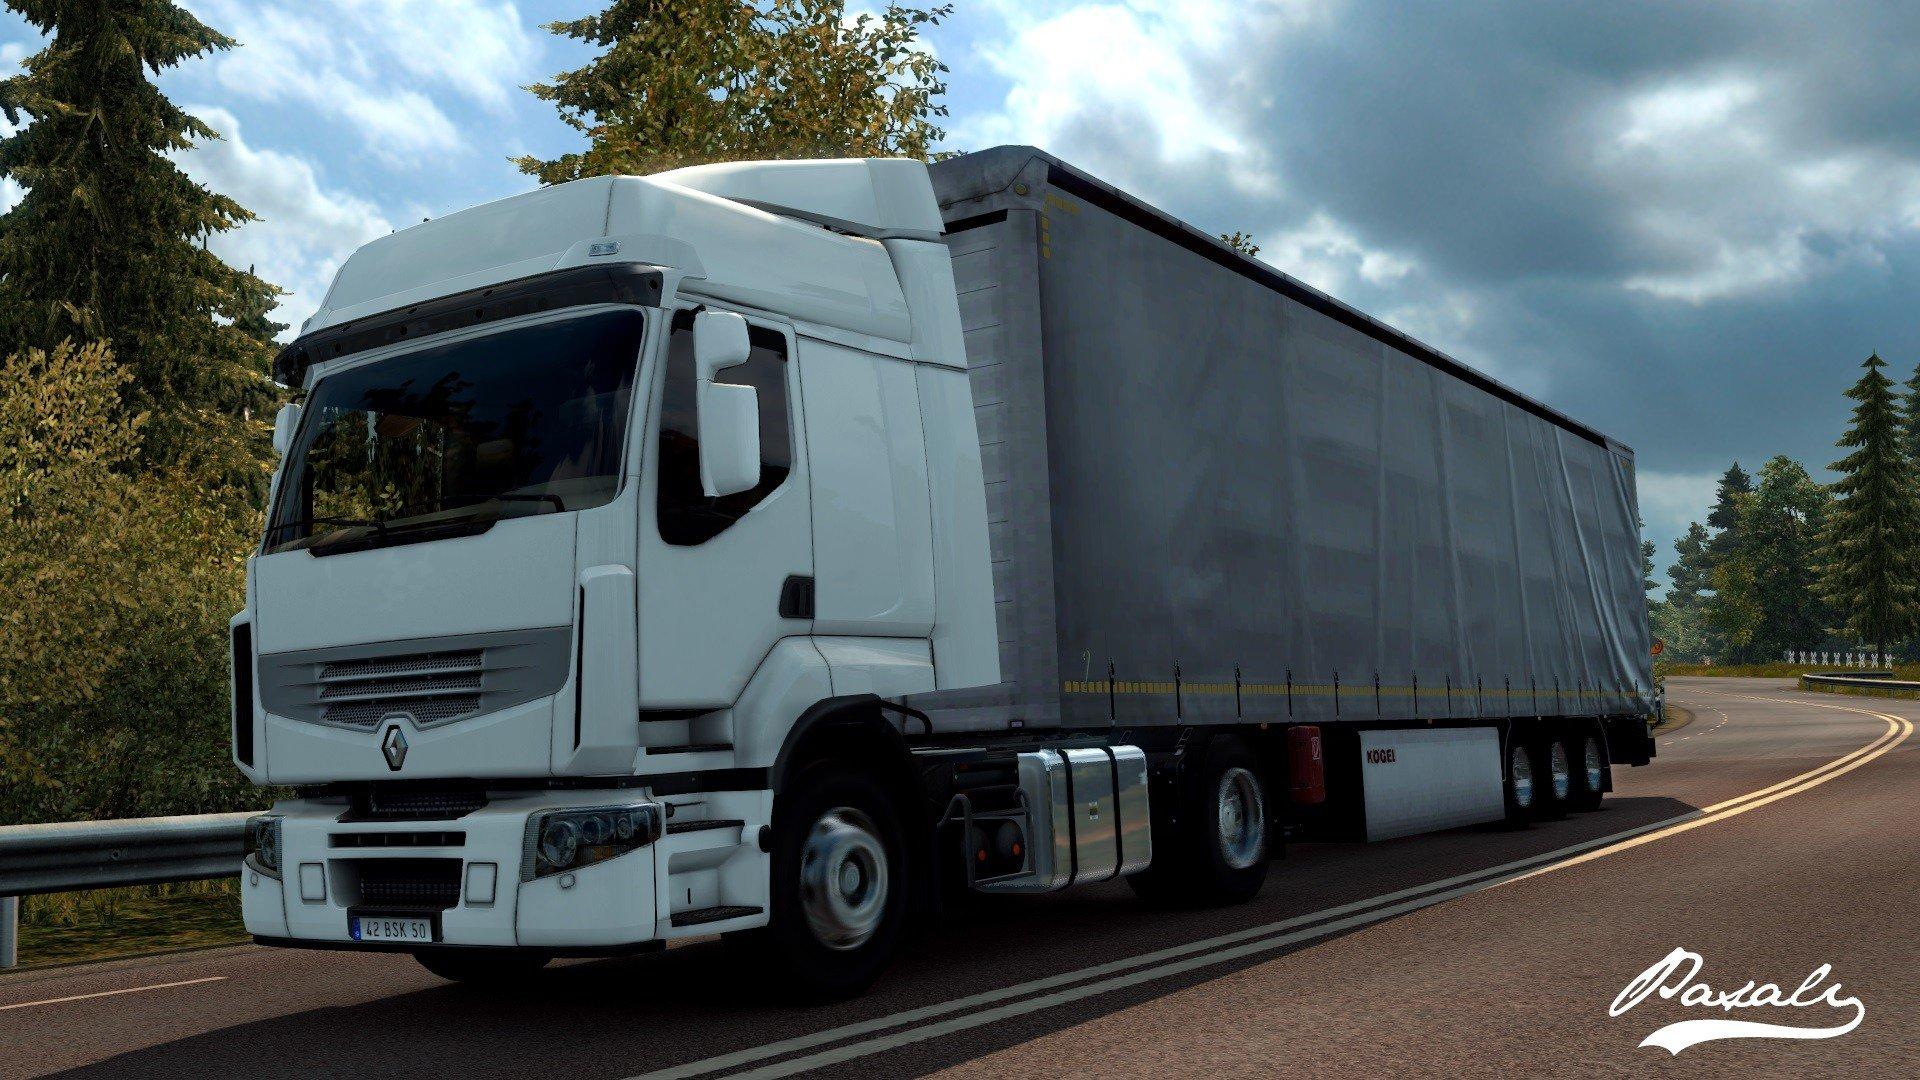 1920x1080 Px Euro Truck Simulator 2 Scania Volvo FH16